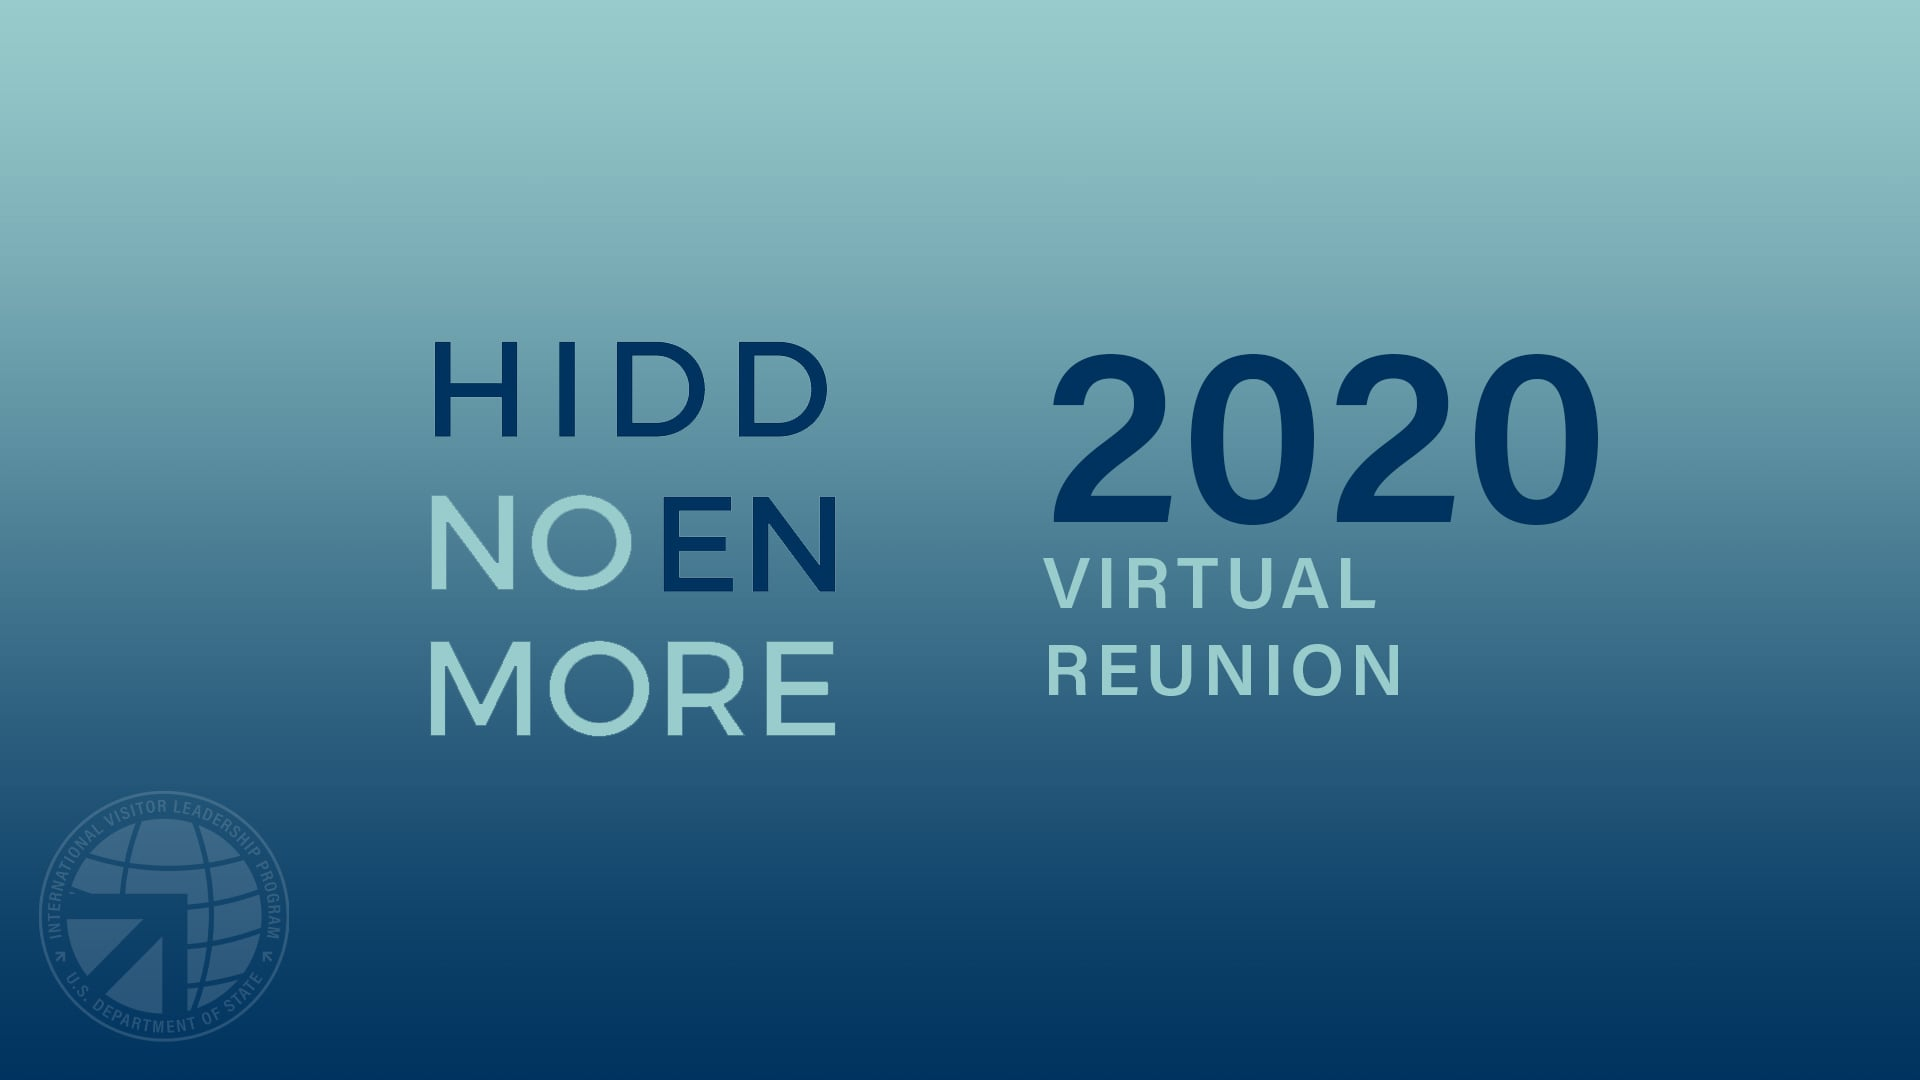 #HiddenNoMore STEM Alumnae Connecting Across Years